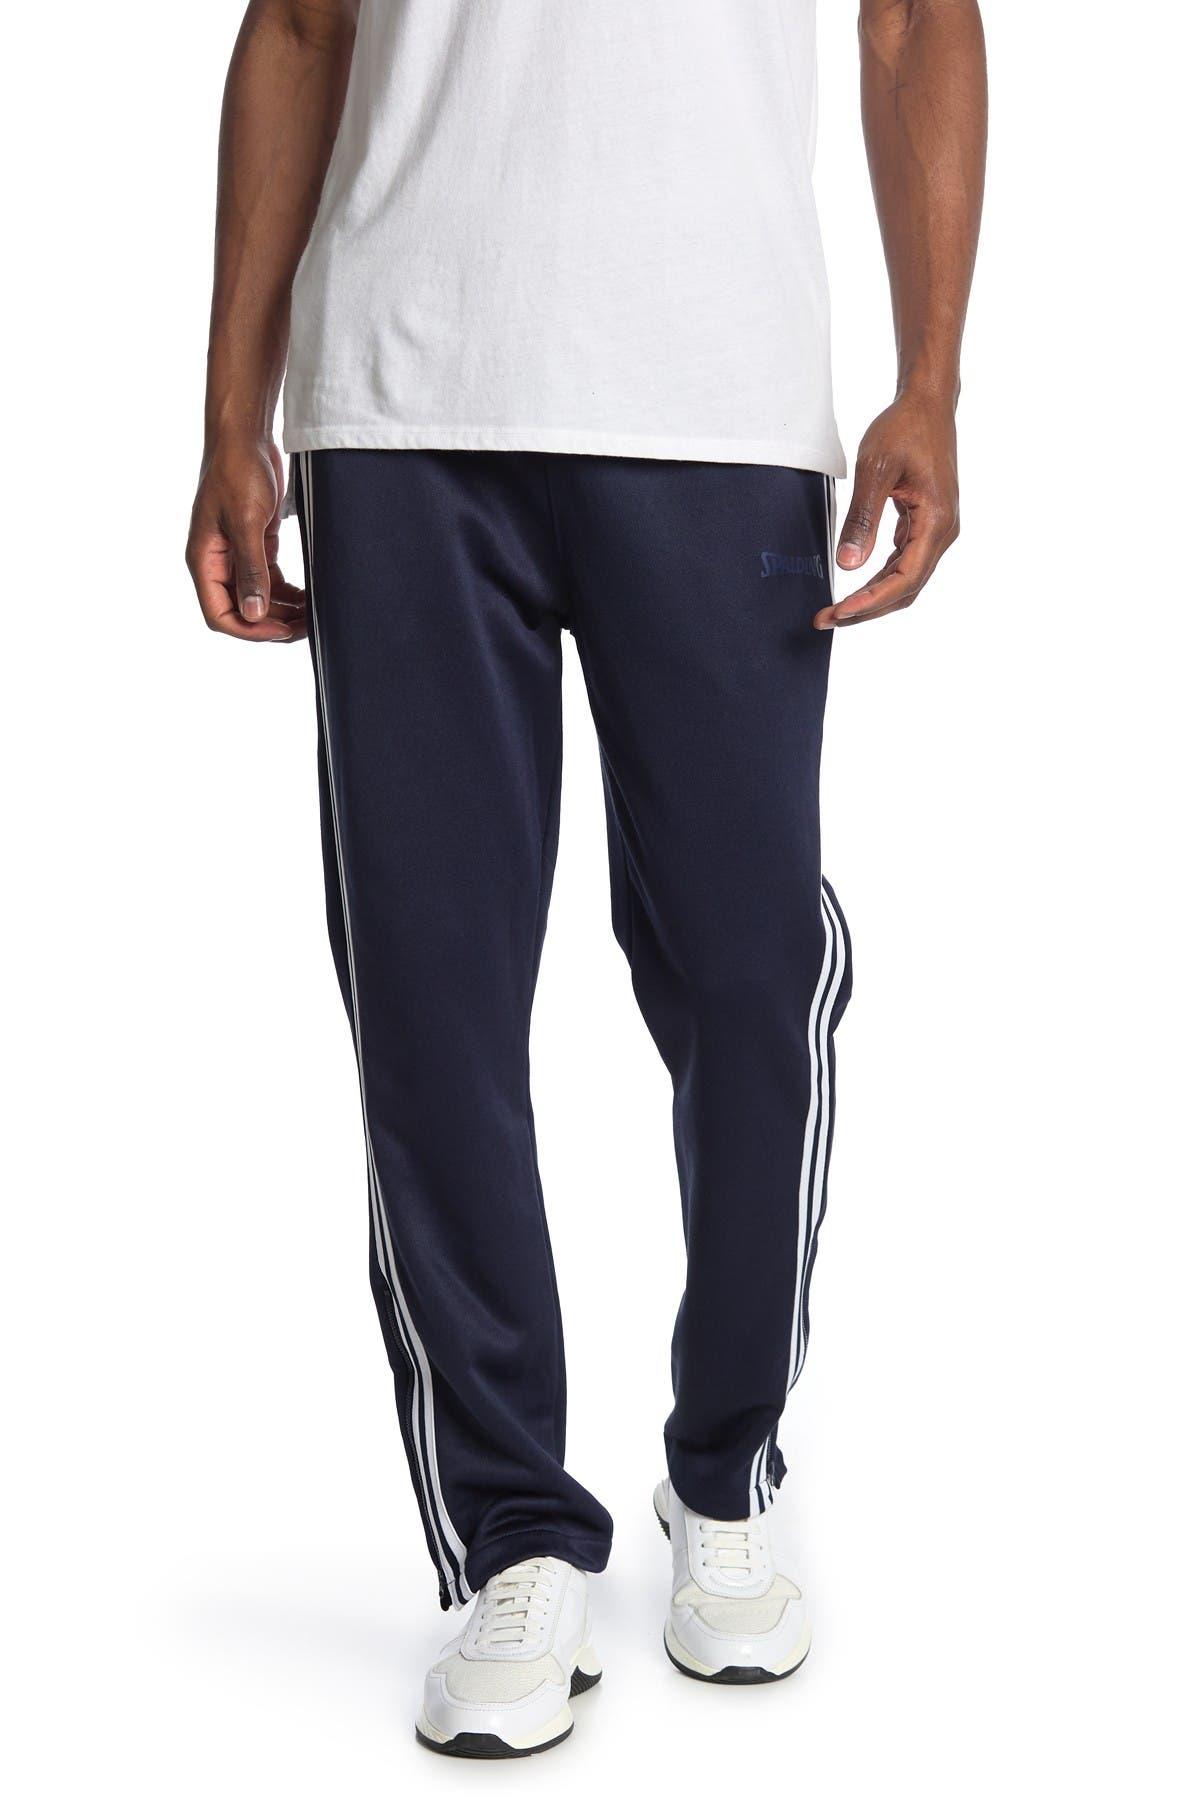 Image of Spalding Shine Face Side Zip Pants